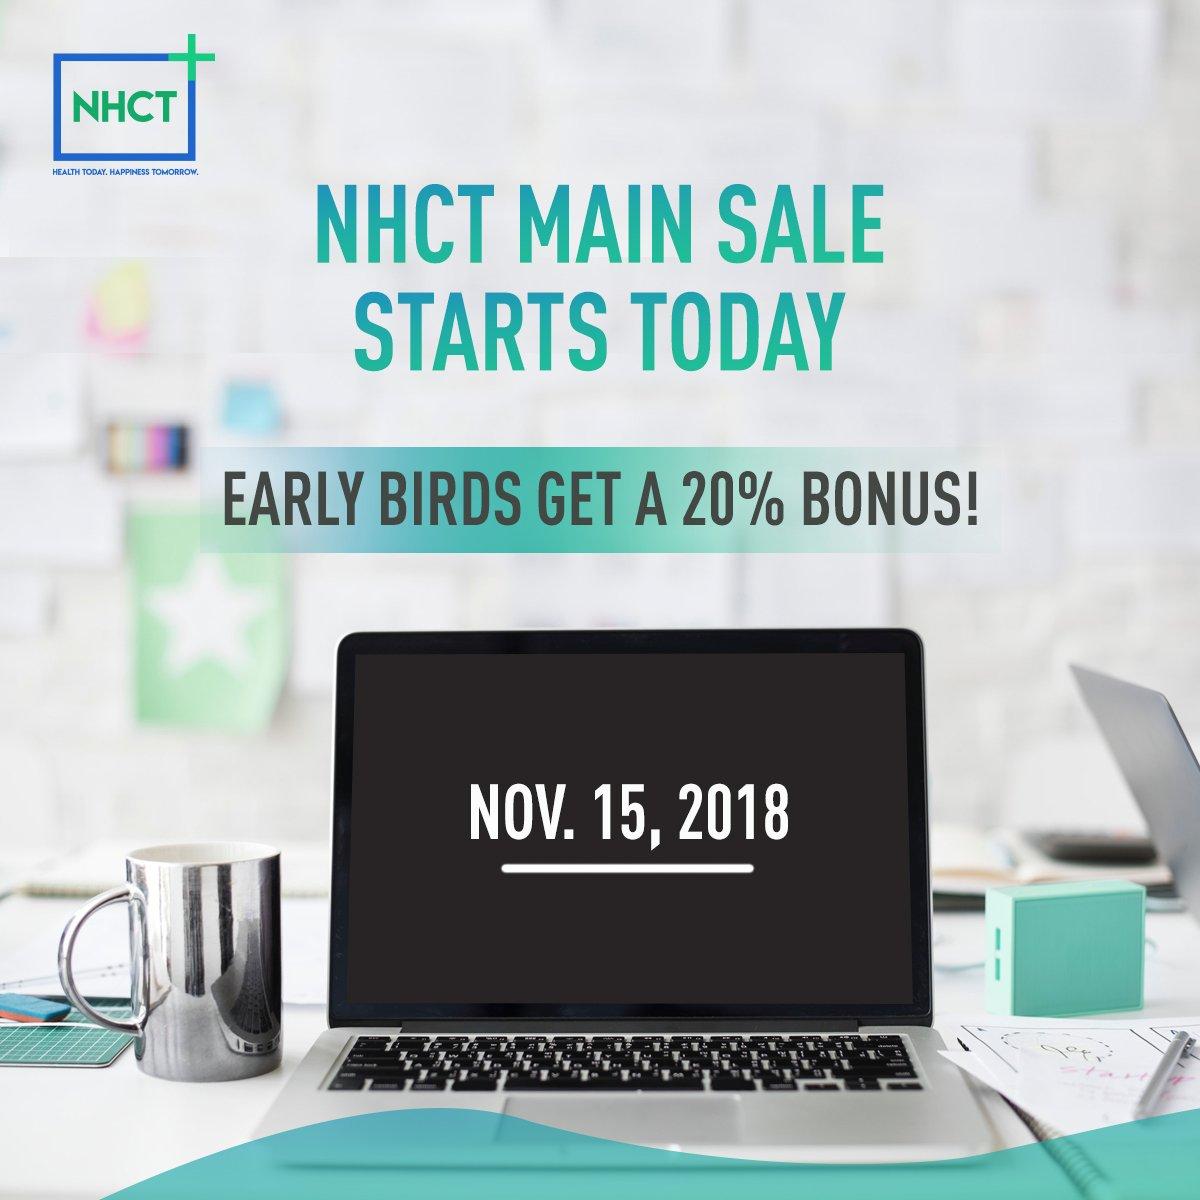 NHCT's Main Sale is finally live. Early birds get an attractive 20% Bonus.  #blockchain #technology #data #innovation #NHCT #ethereum #MainSale #TokenSale #satoshi<br>http://pic.twitter.com/qQGEHu1IQp